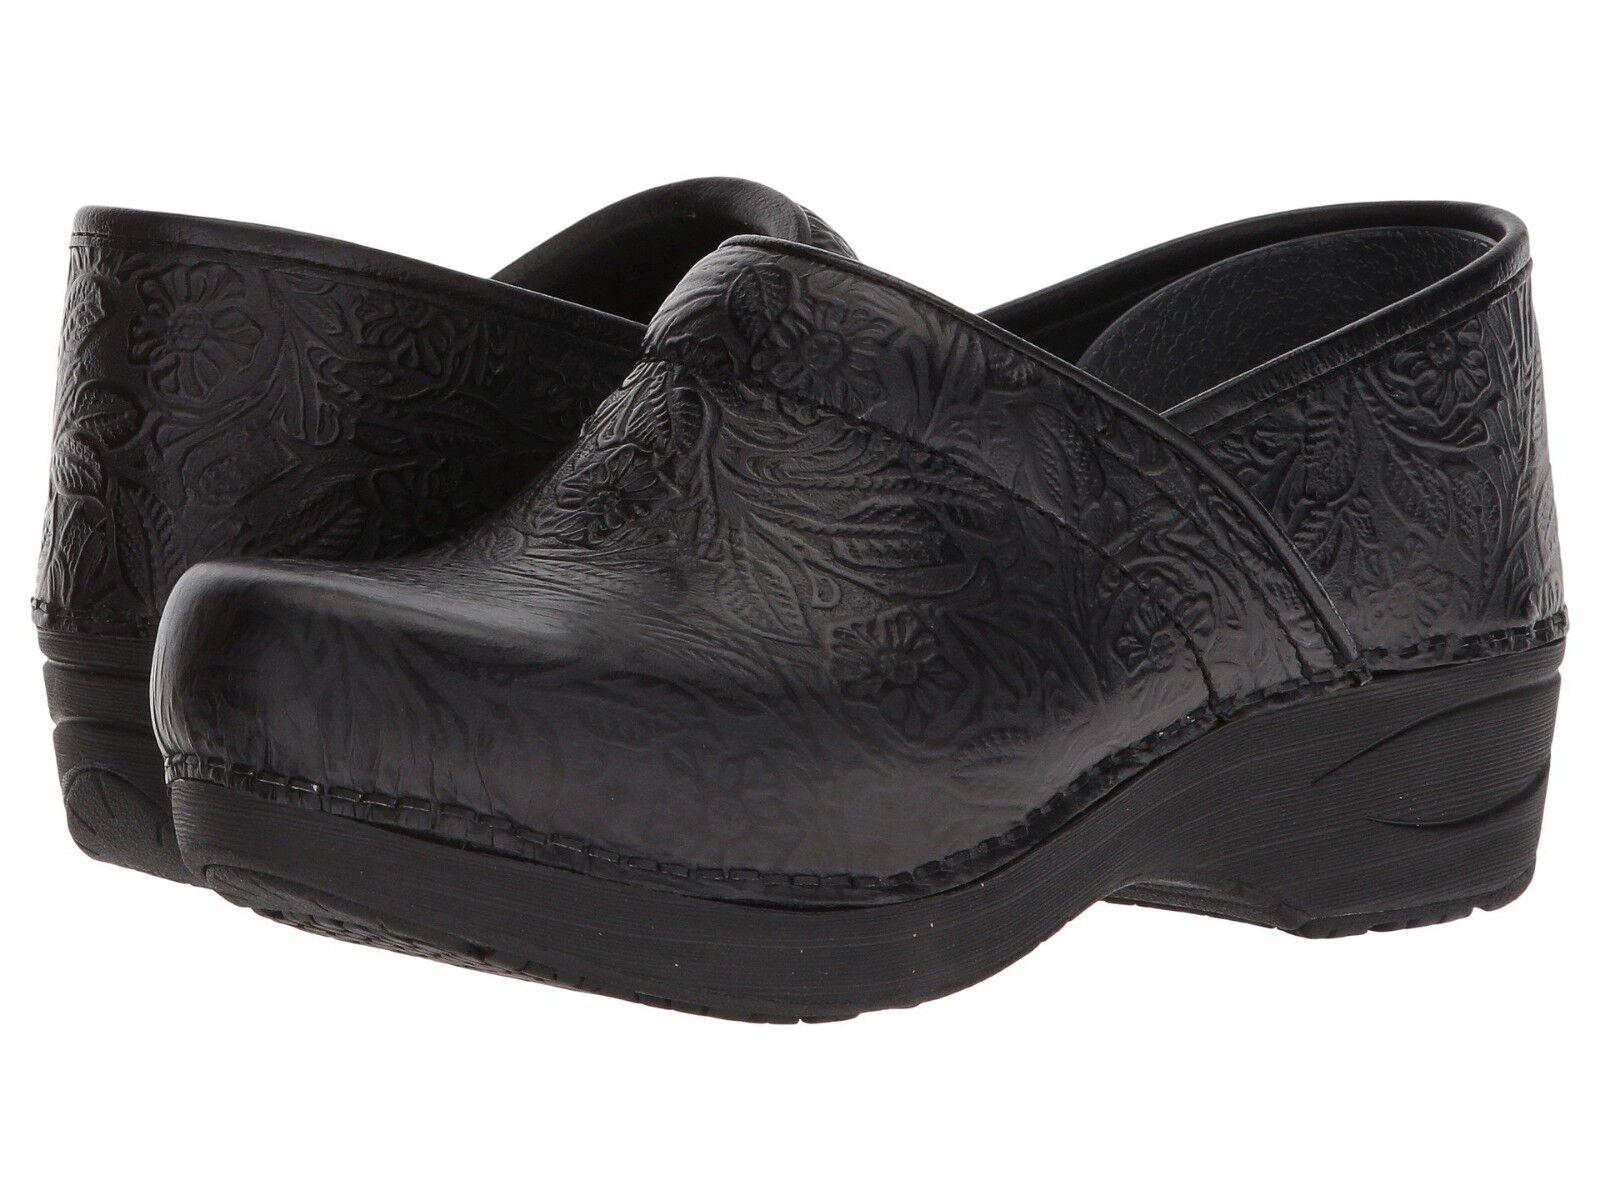 Dansko PRO XP 2.0 schwarz FLORAL TOOLED damen Leather Slip Slip Slip Resistant Clogs schuhe 17b317